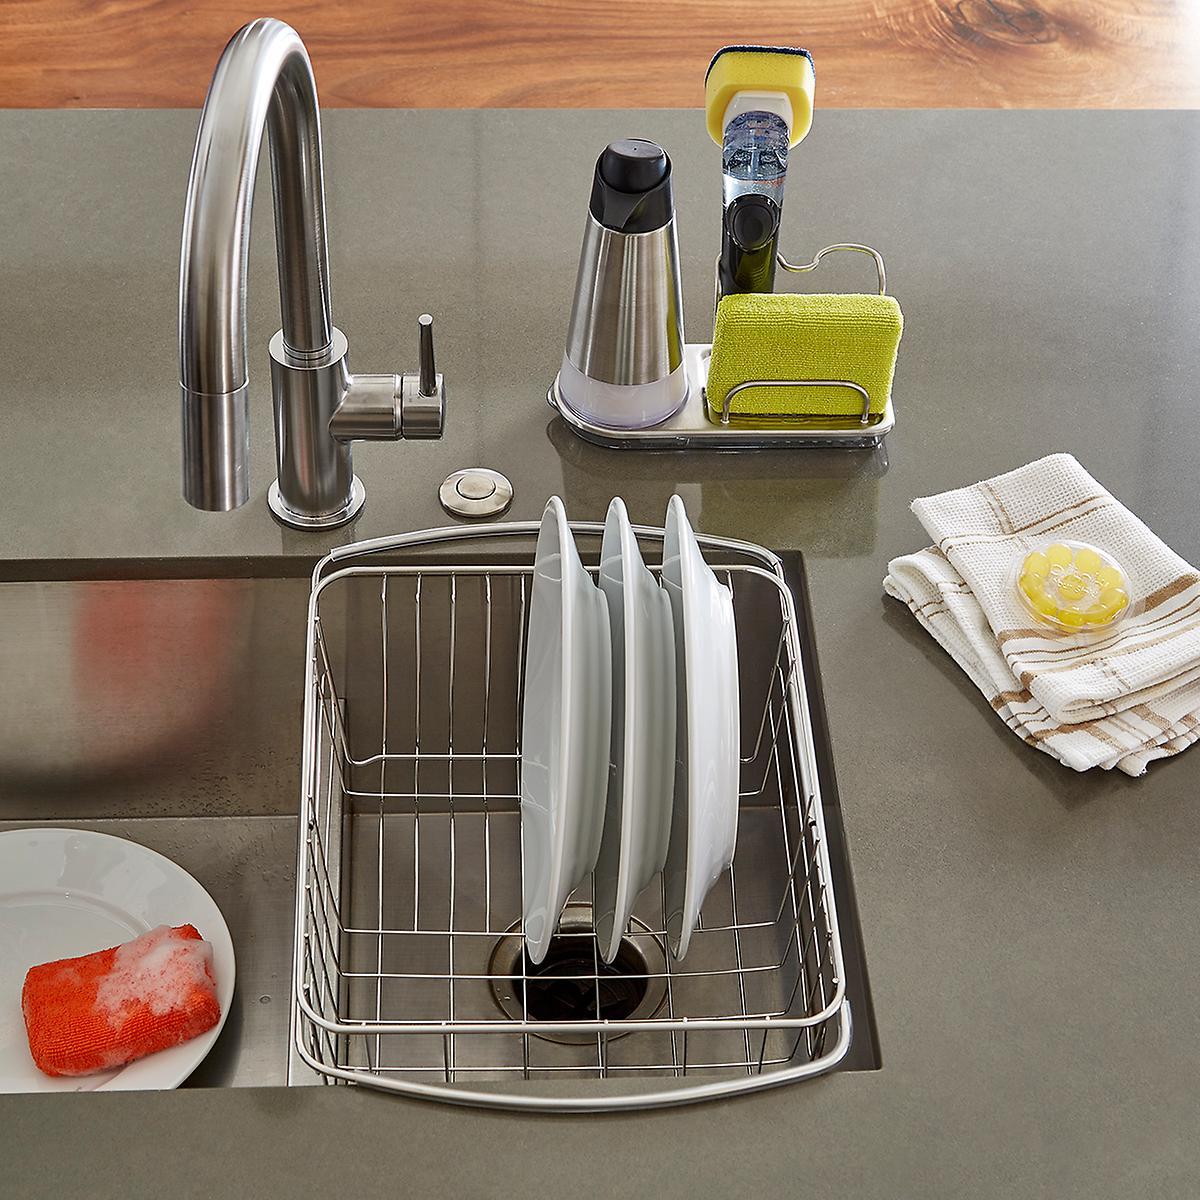 Oxo Kitchen Sink Brush